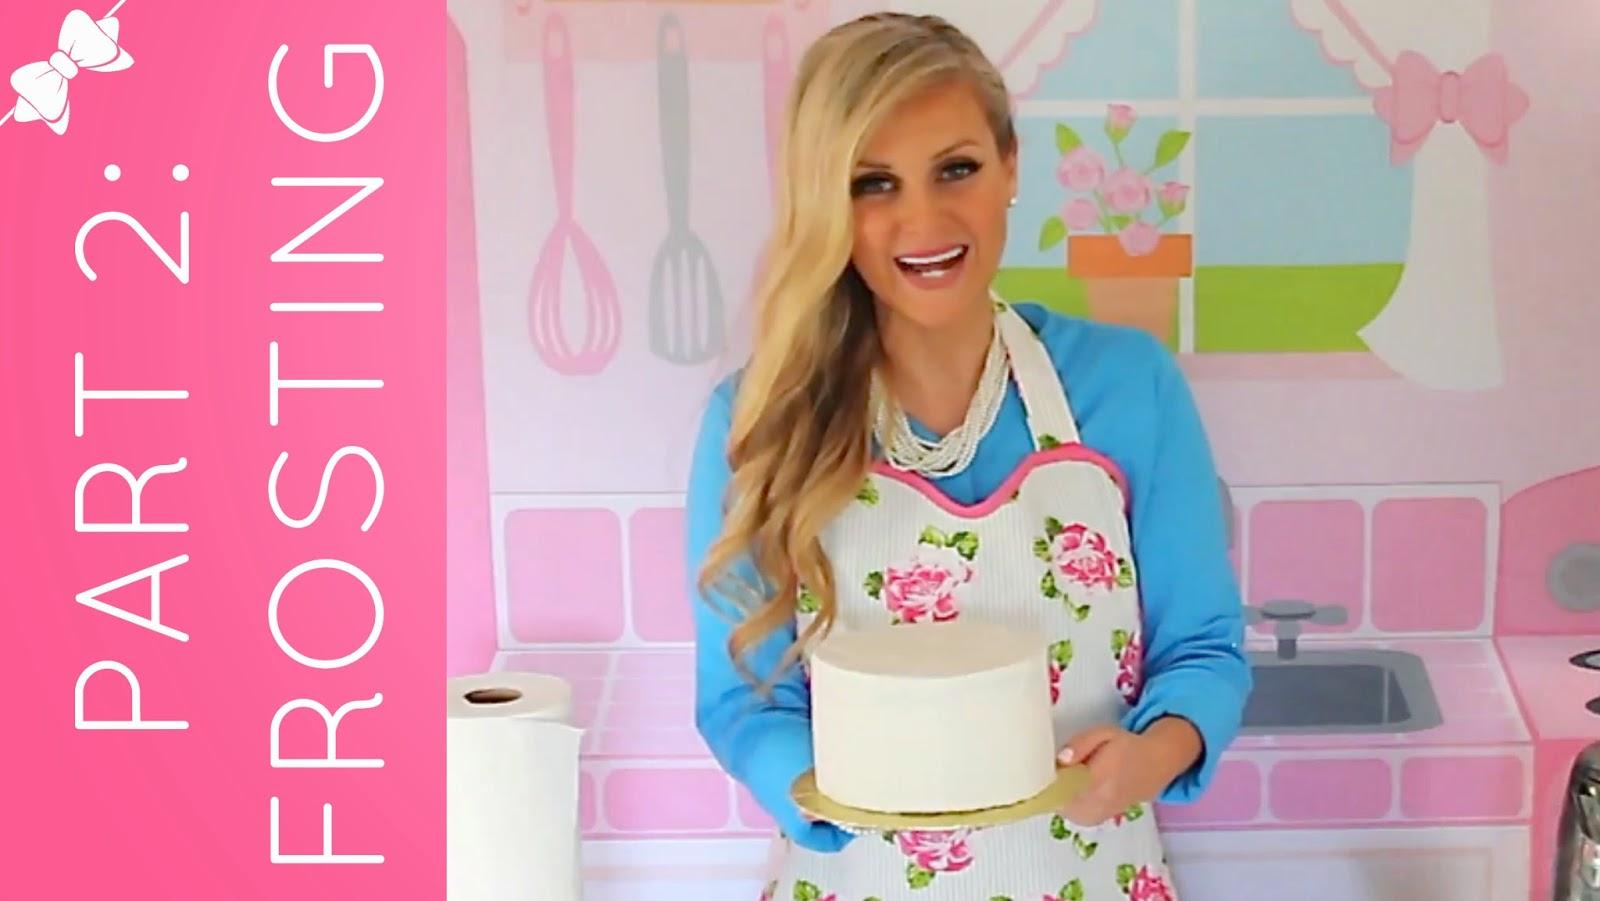 http://blog.dollhousebakeshoppe.com/2015/04/video-cake-decorating-101-part-2-tricks.html